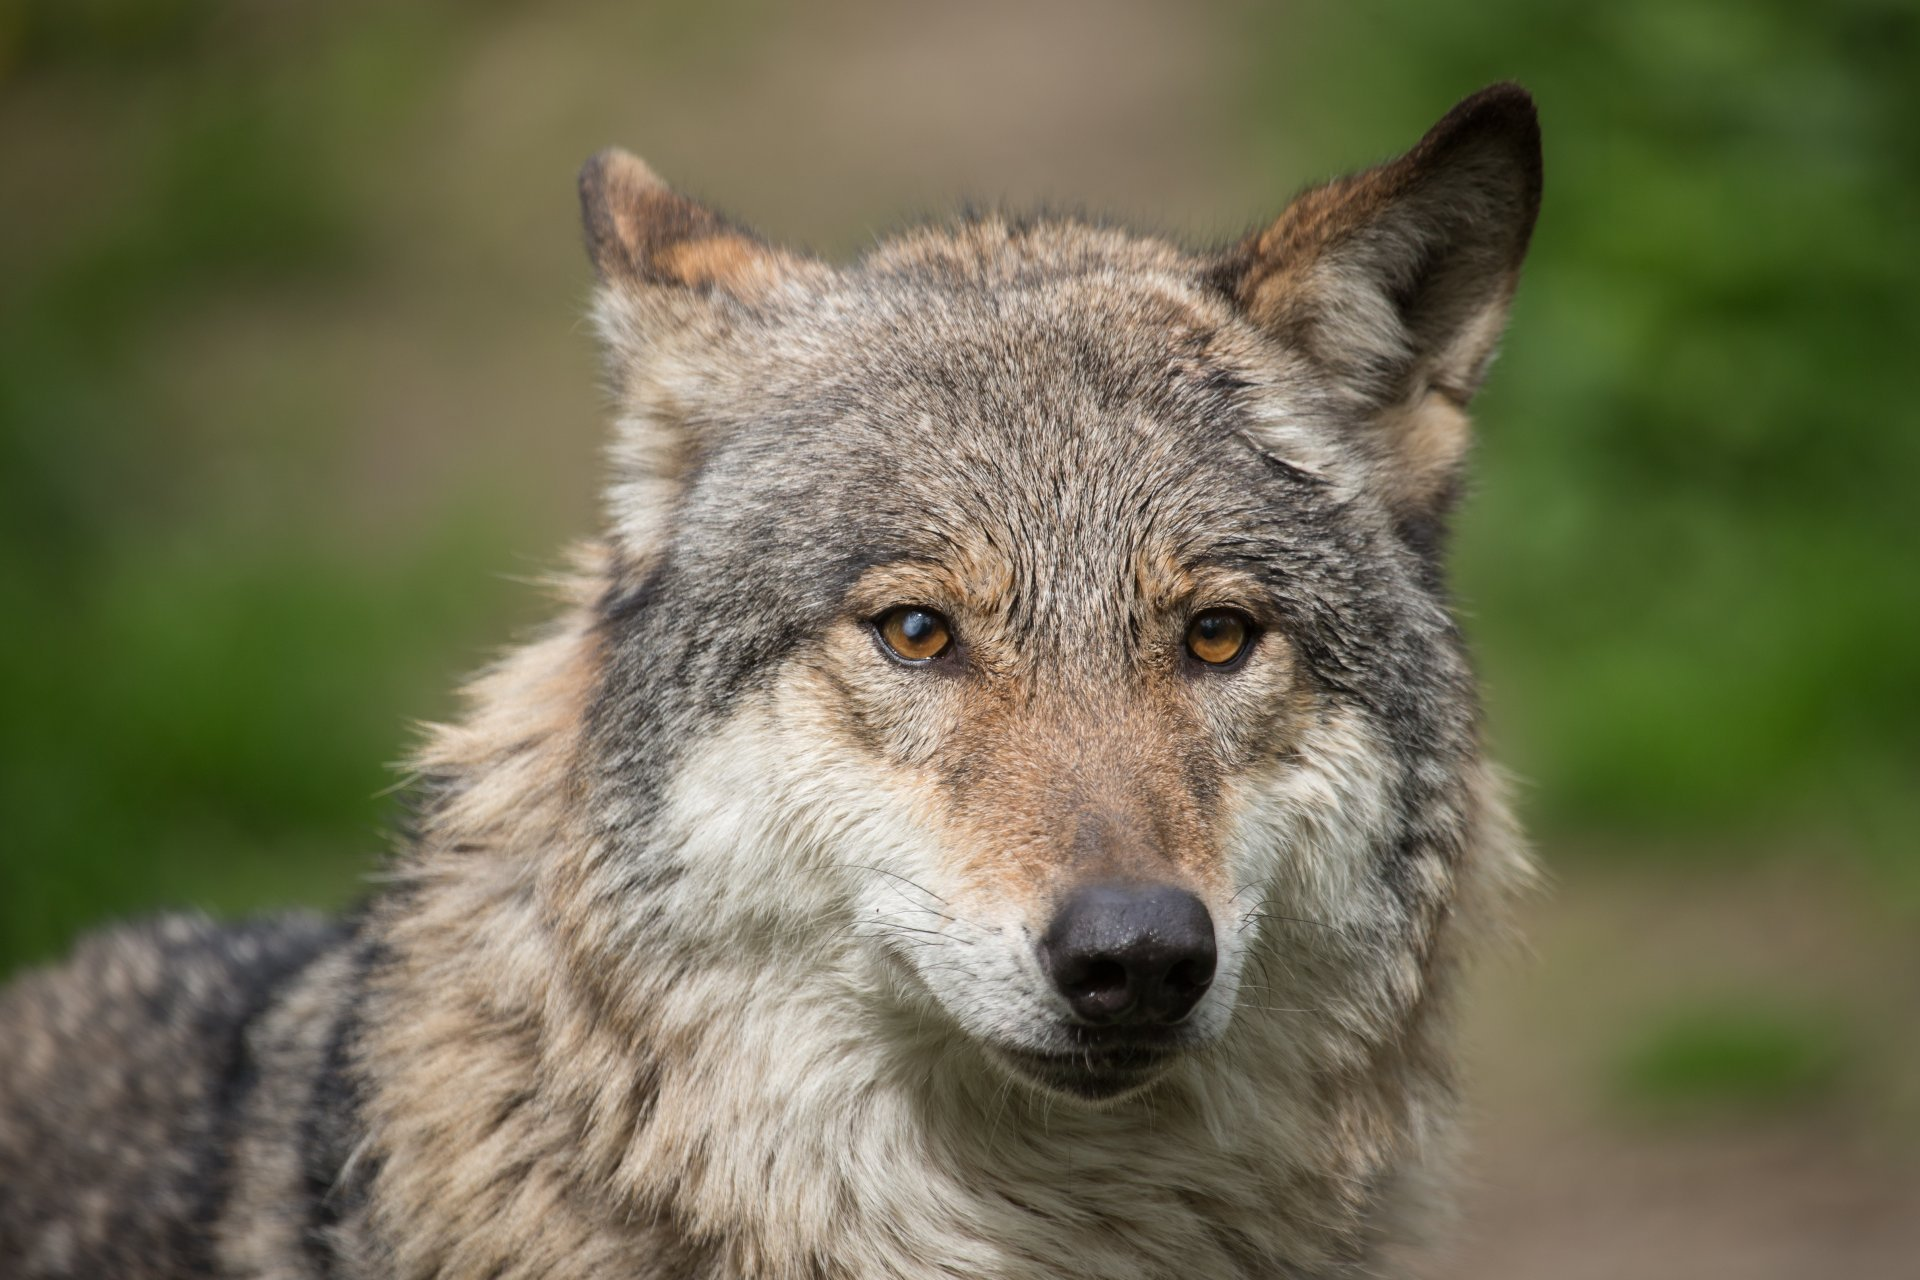 Wolf Face Wallpapers - WallpaperSafari